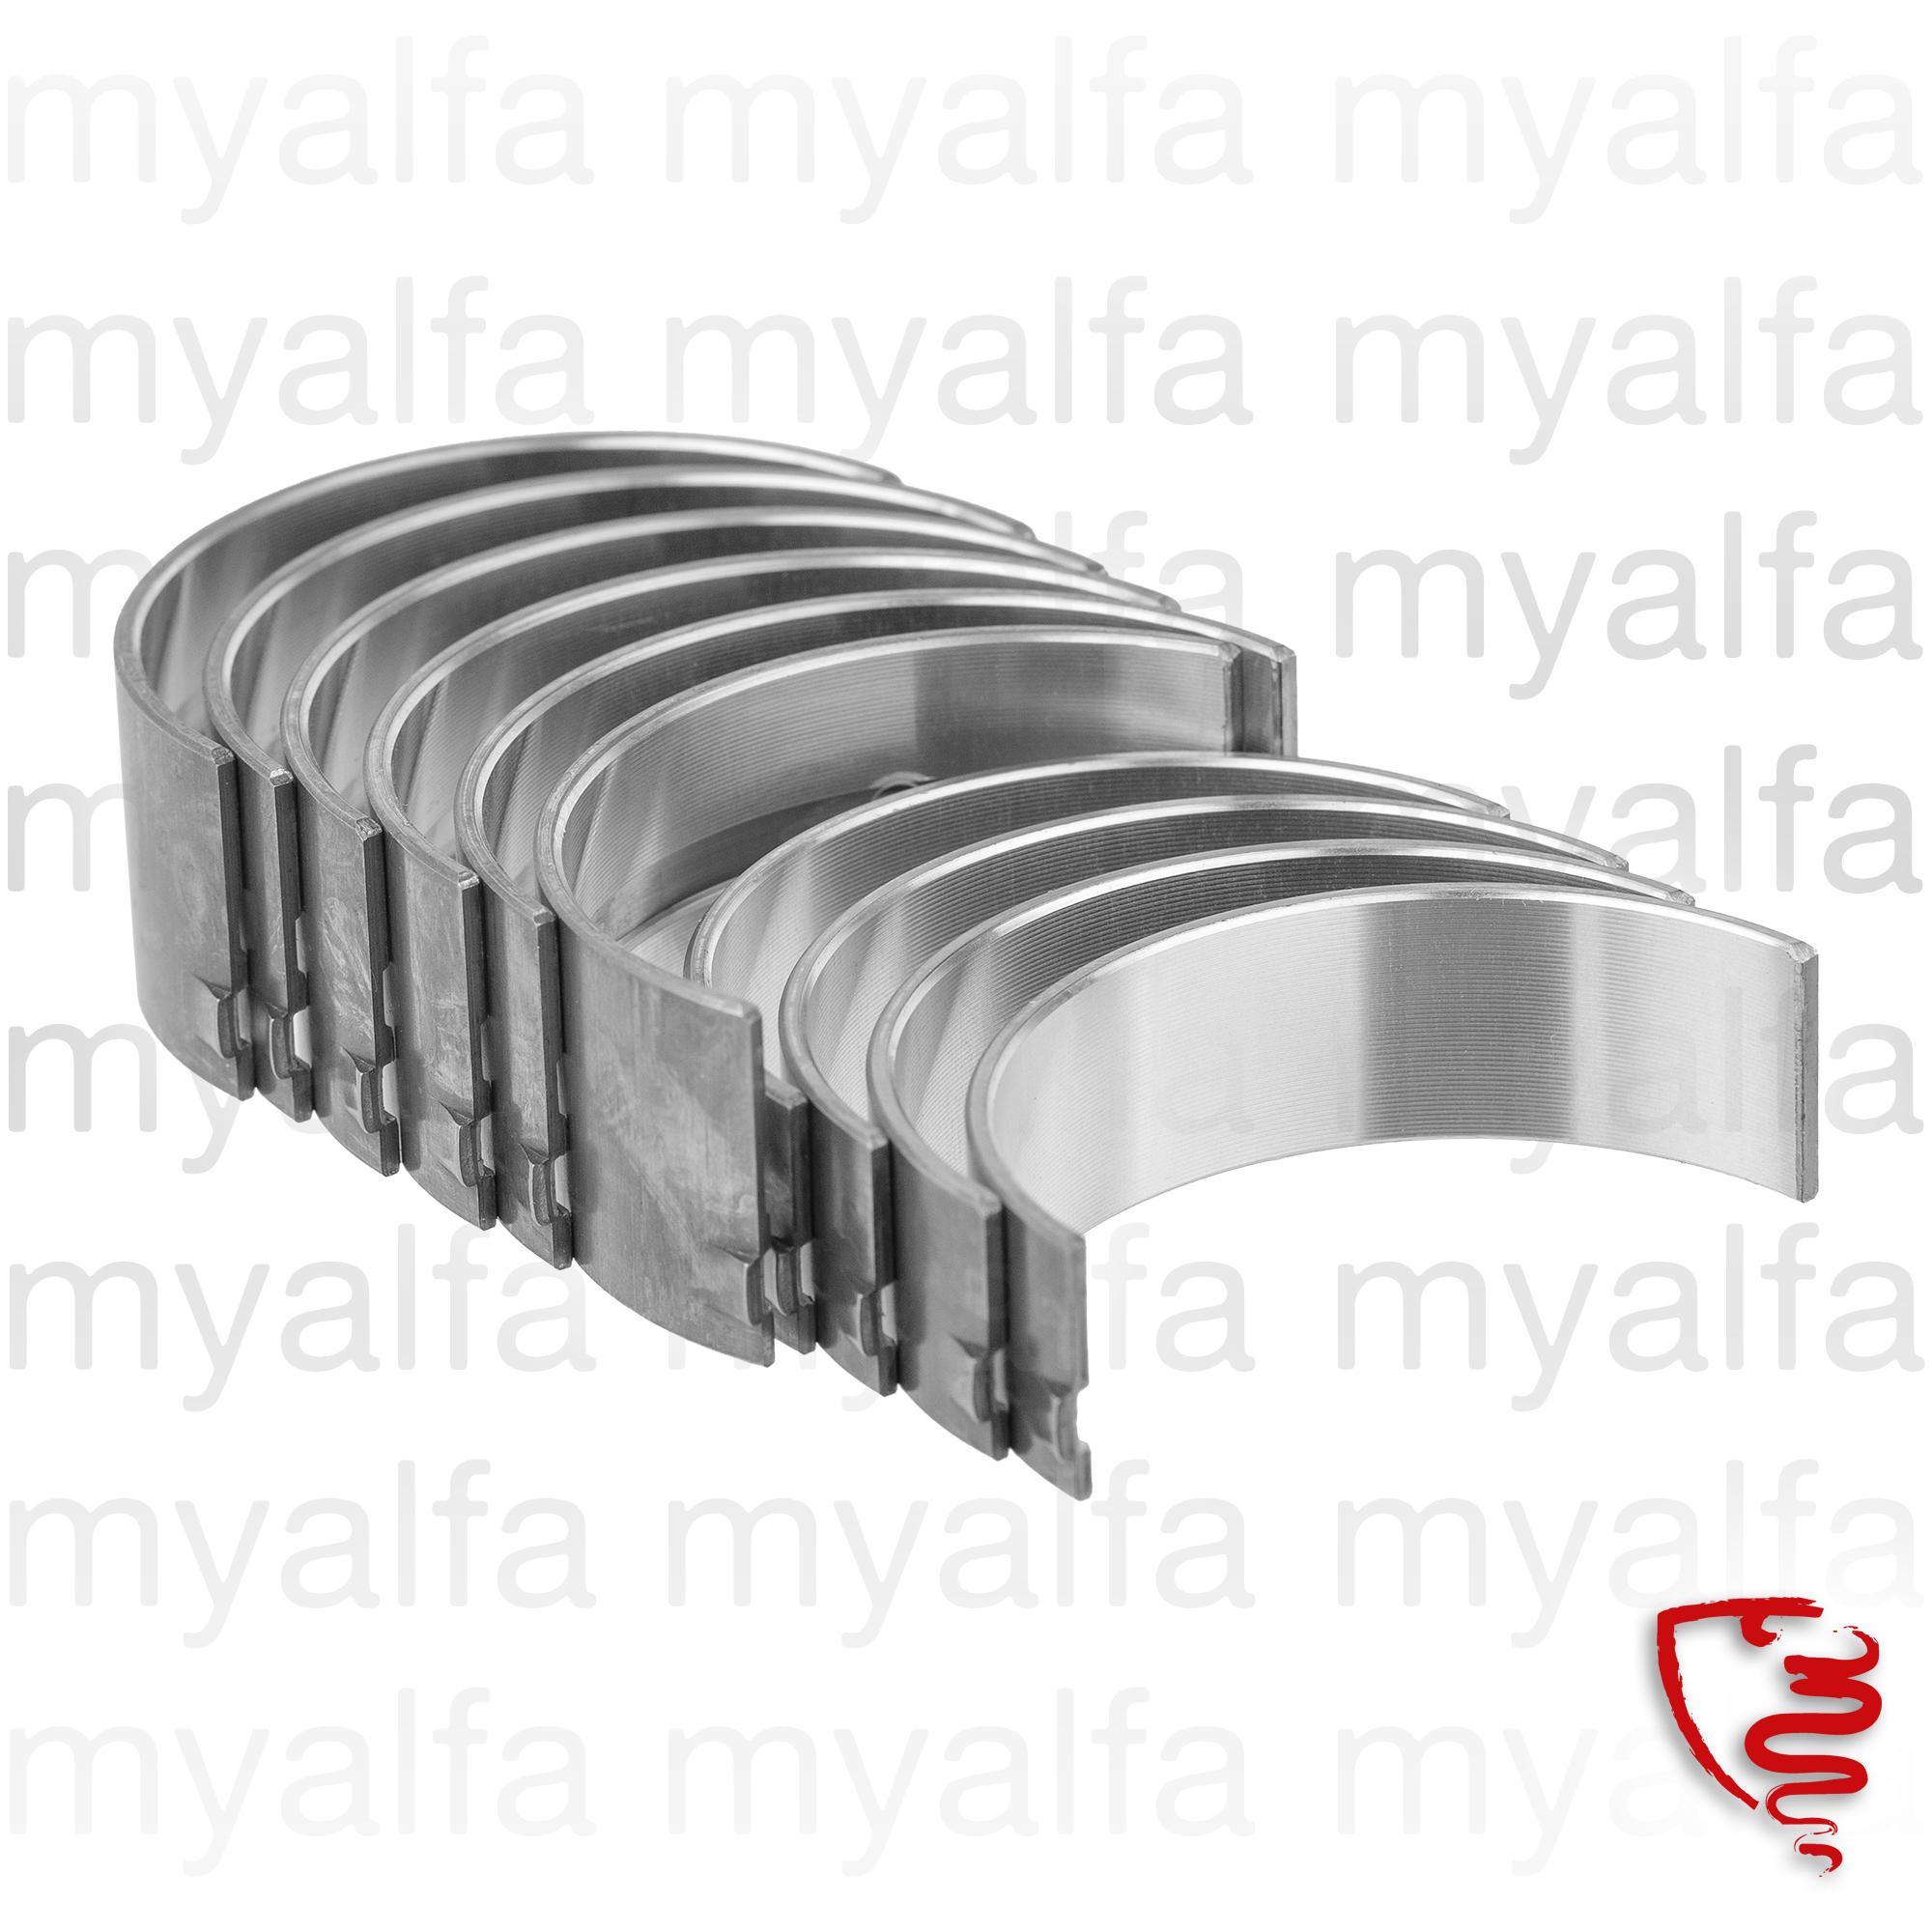 Game bronzes crankshaft 750 STD 010 for 750/101, Engine, Engine Block, Crankshaft/Bearing